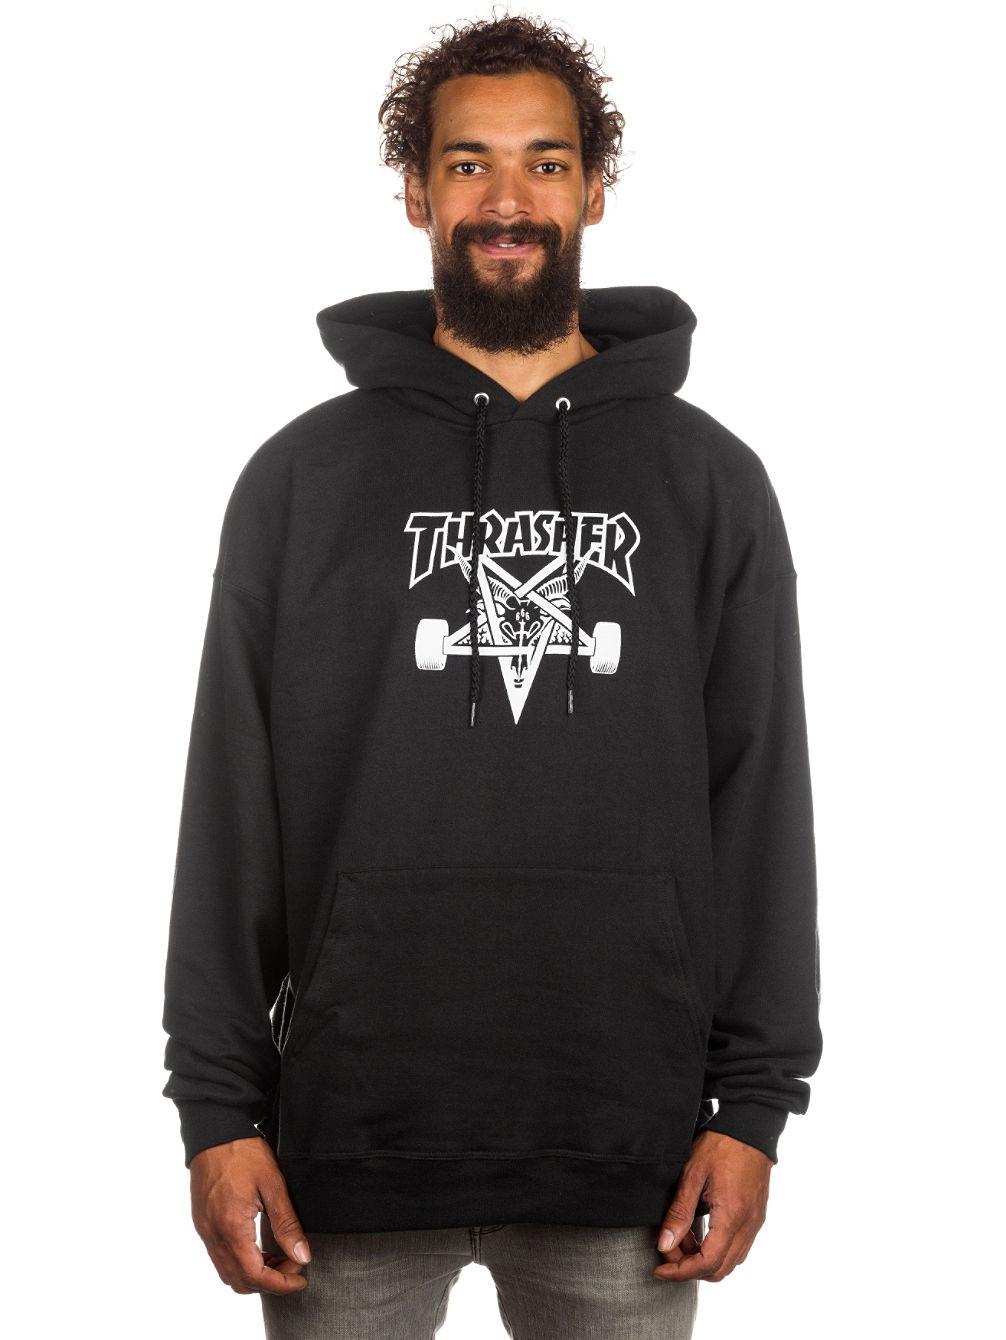 Buy Thrasher Skate Goat Hoodie online at blue-tomato.com 27c8c1d3bb5a